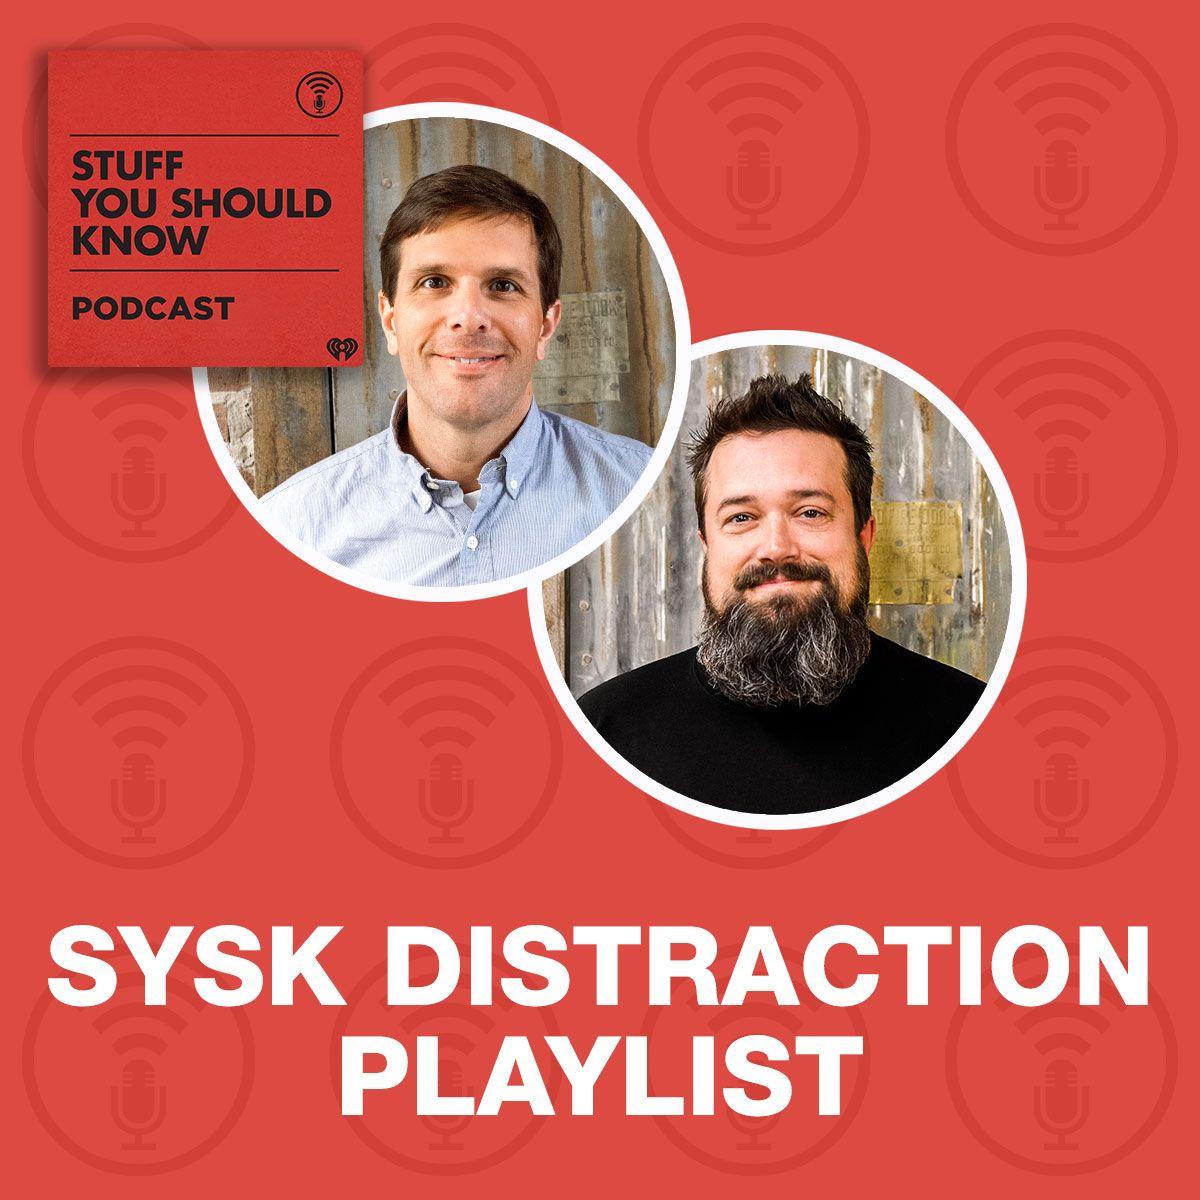 SYSK Distraction Playlist: SYSK Live: How Bars Work